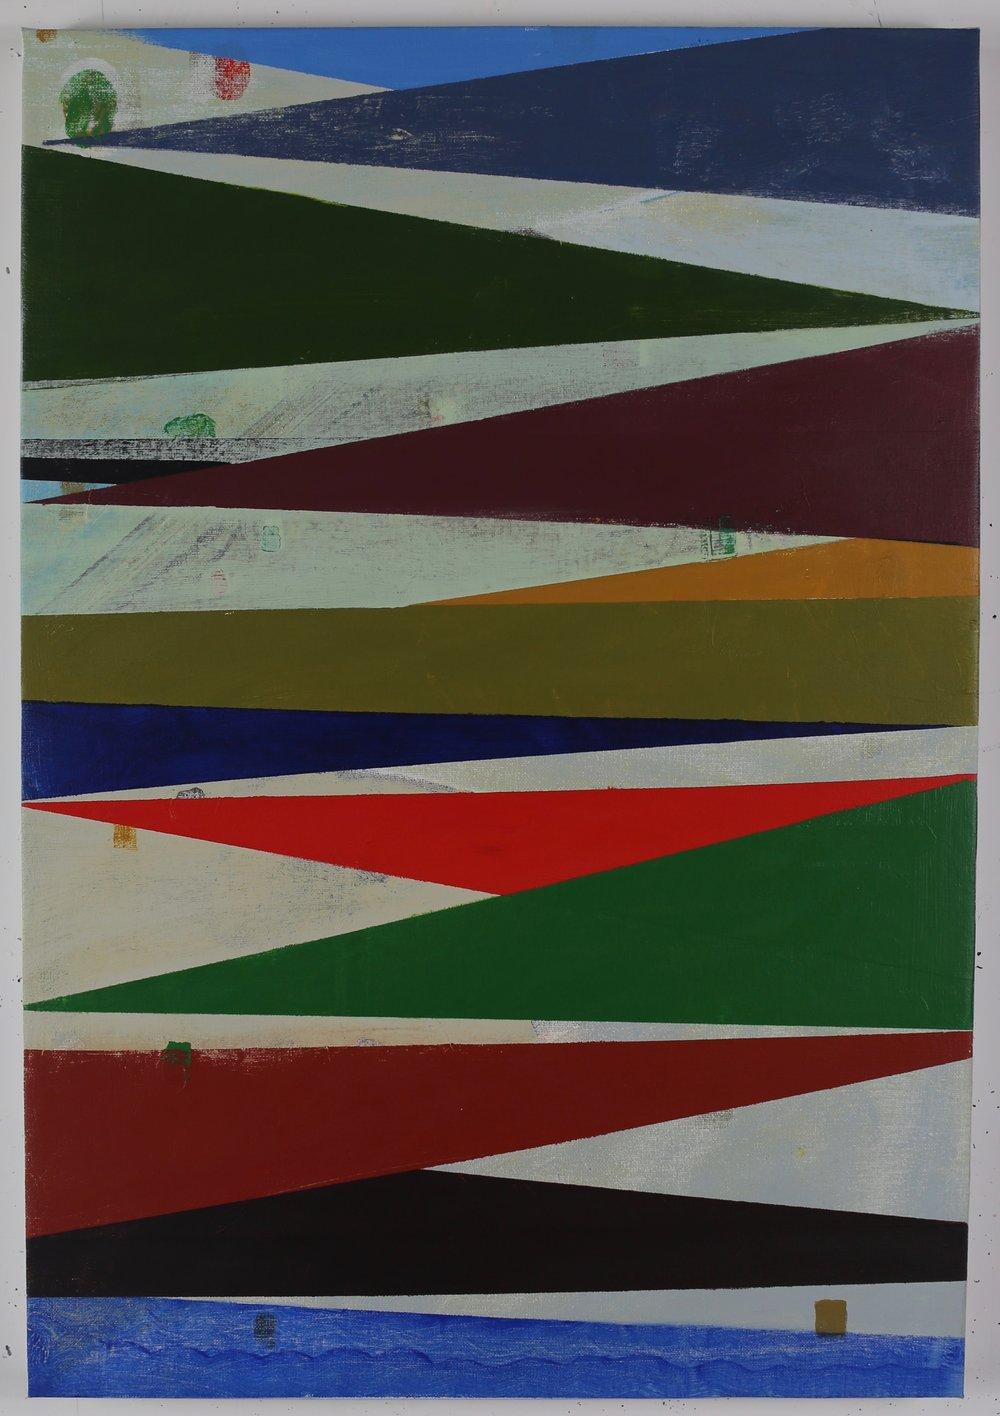 8-Bit Radiant, 2018, acrylic on canvas, 71 x 49 cm